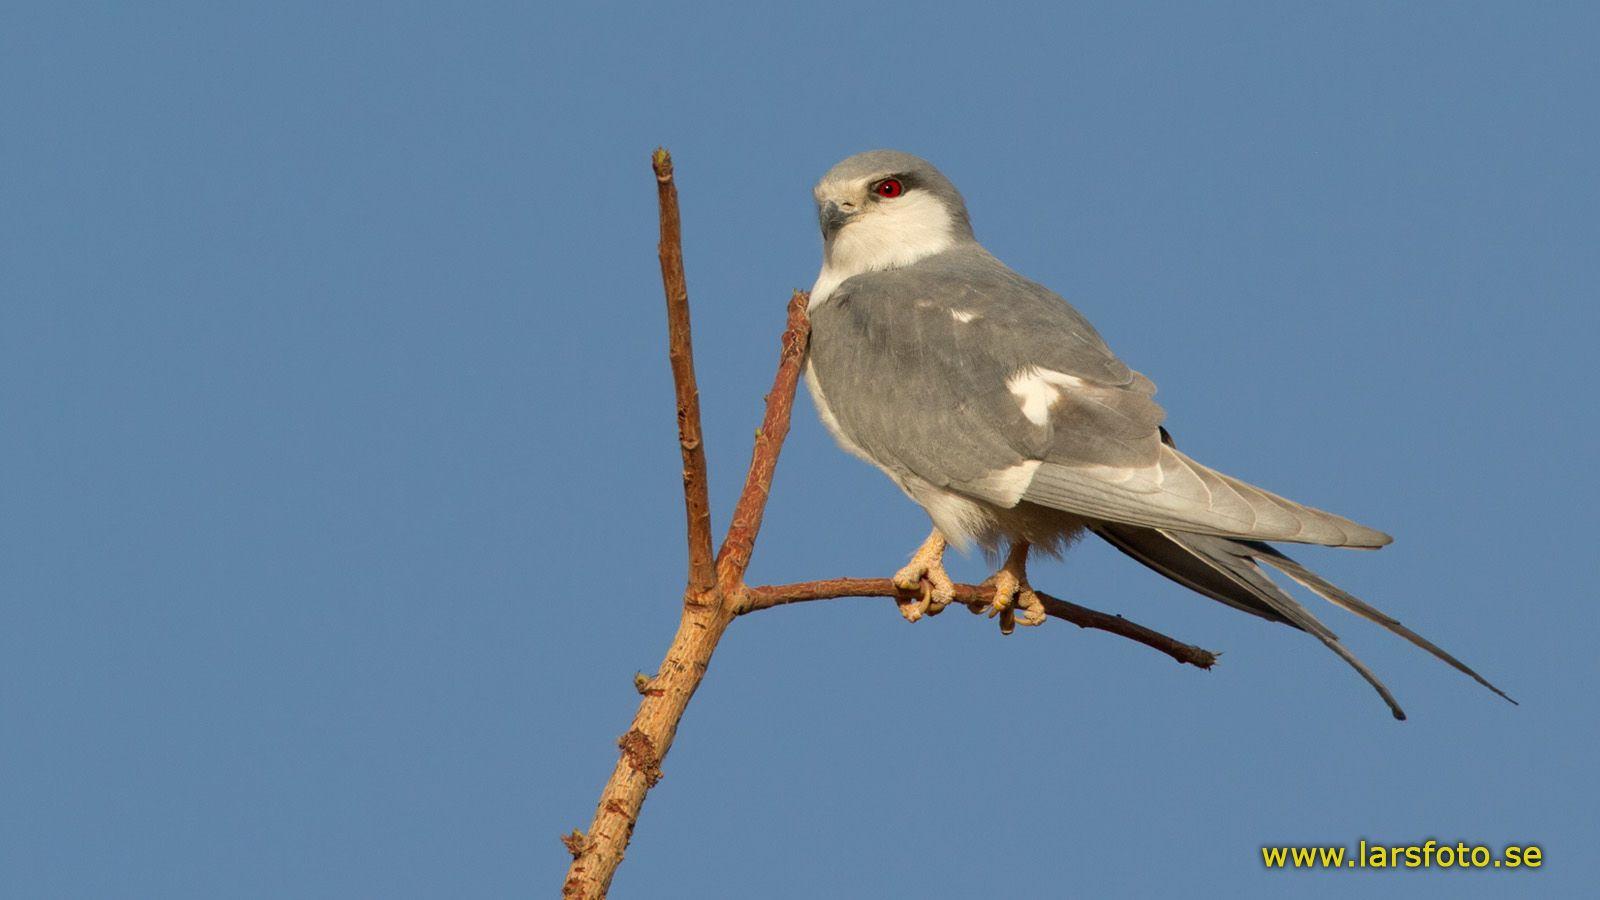 998_Scissor-tailed_Kite_Chelictinia_riocourii_Mora_Cameroon_20120310_1_1600_copy.jpg (1600×900)